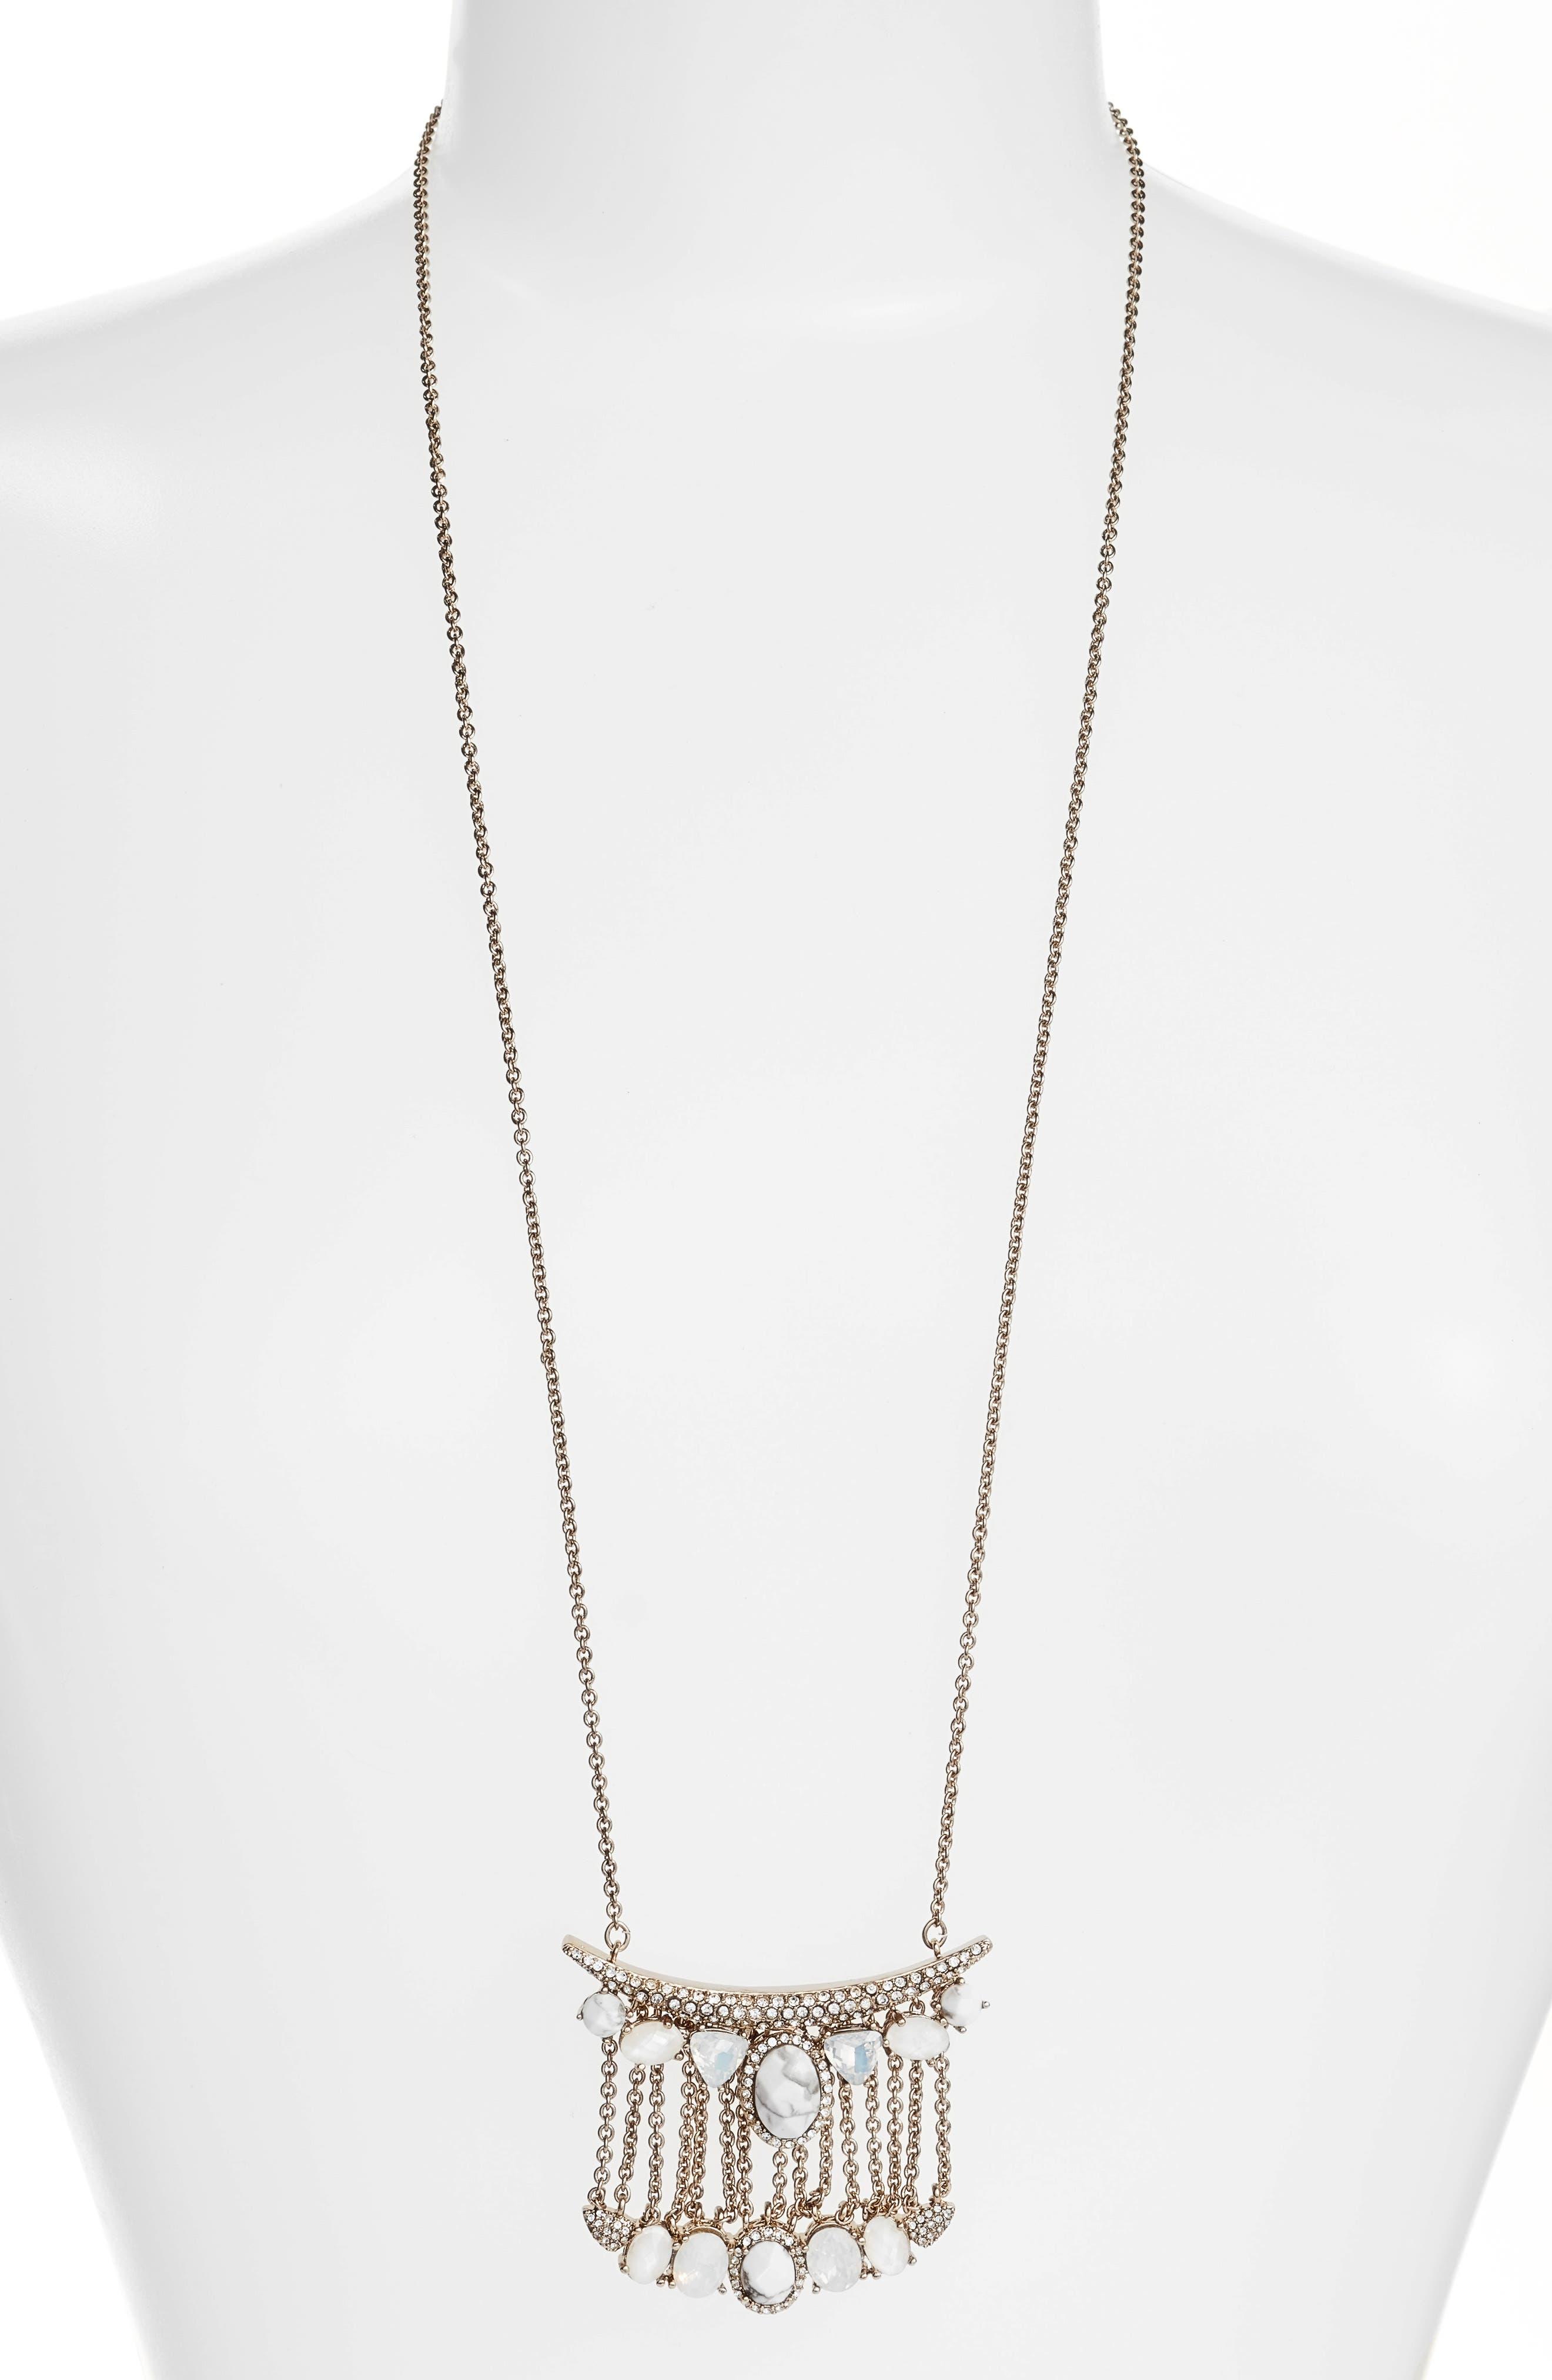 Jenny Packham Wanderlust Pendant Necklace